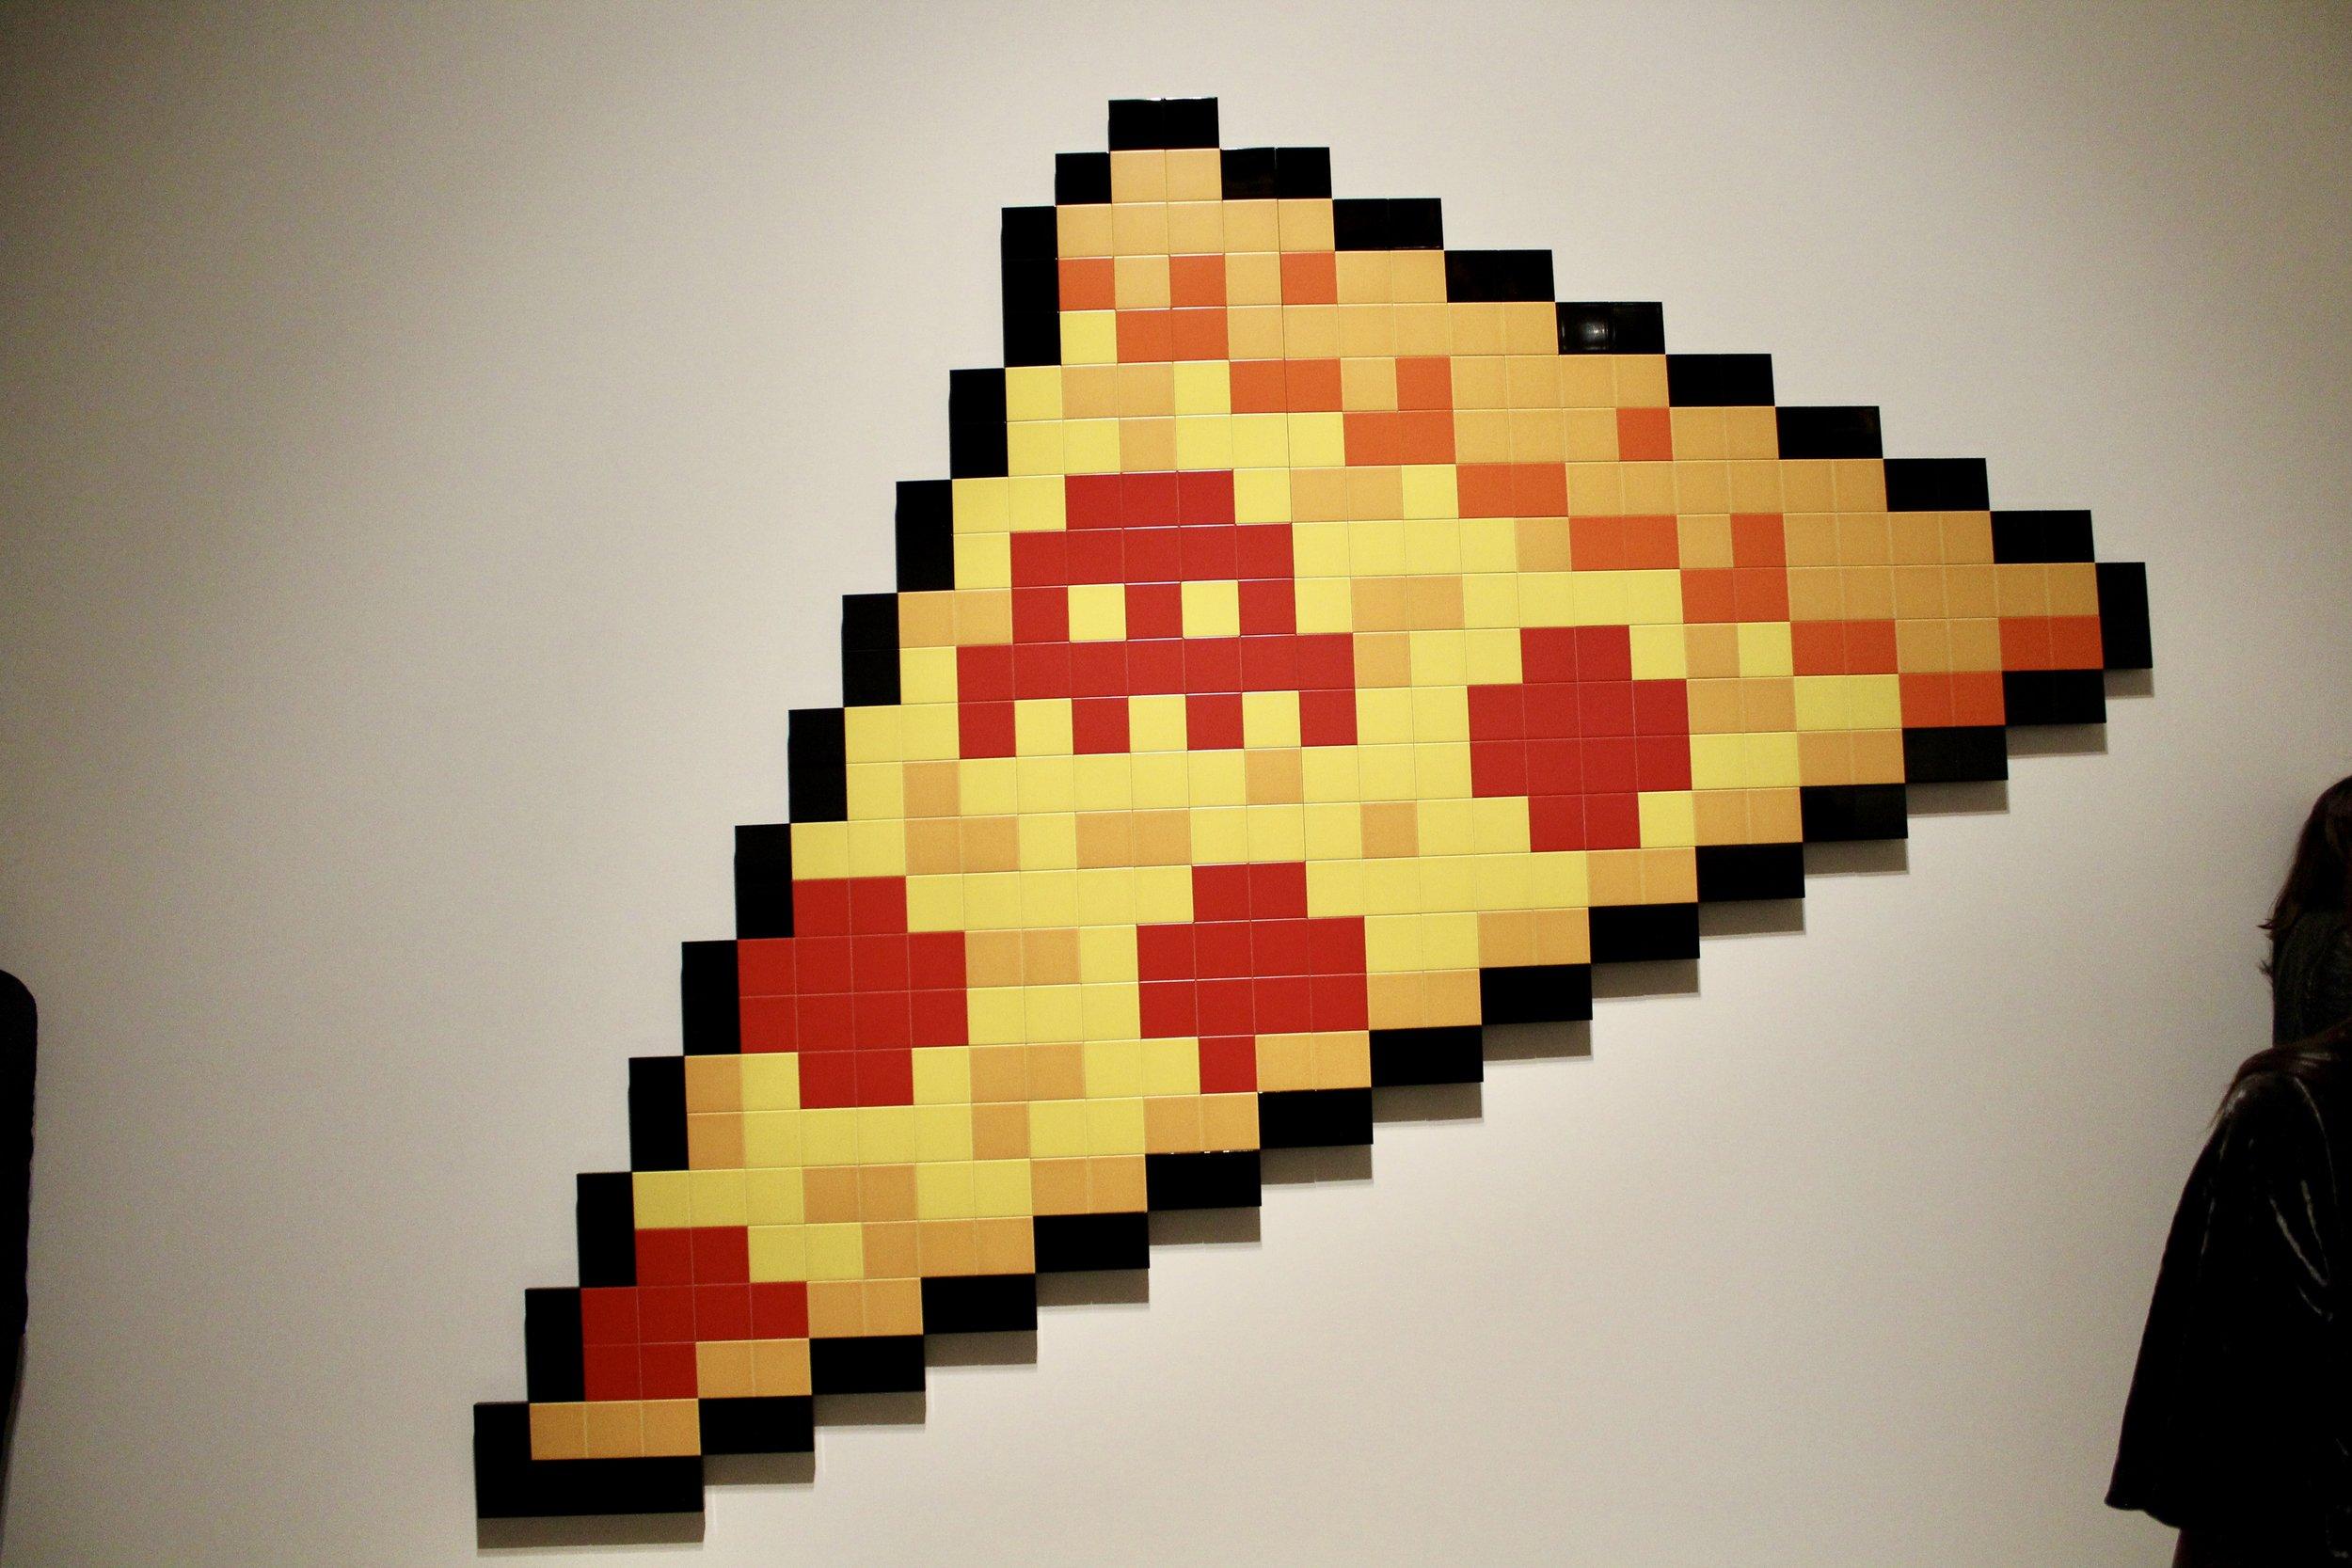 Invader pizza